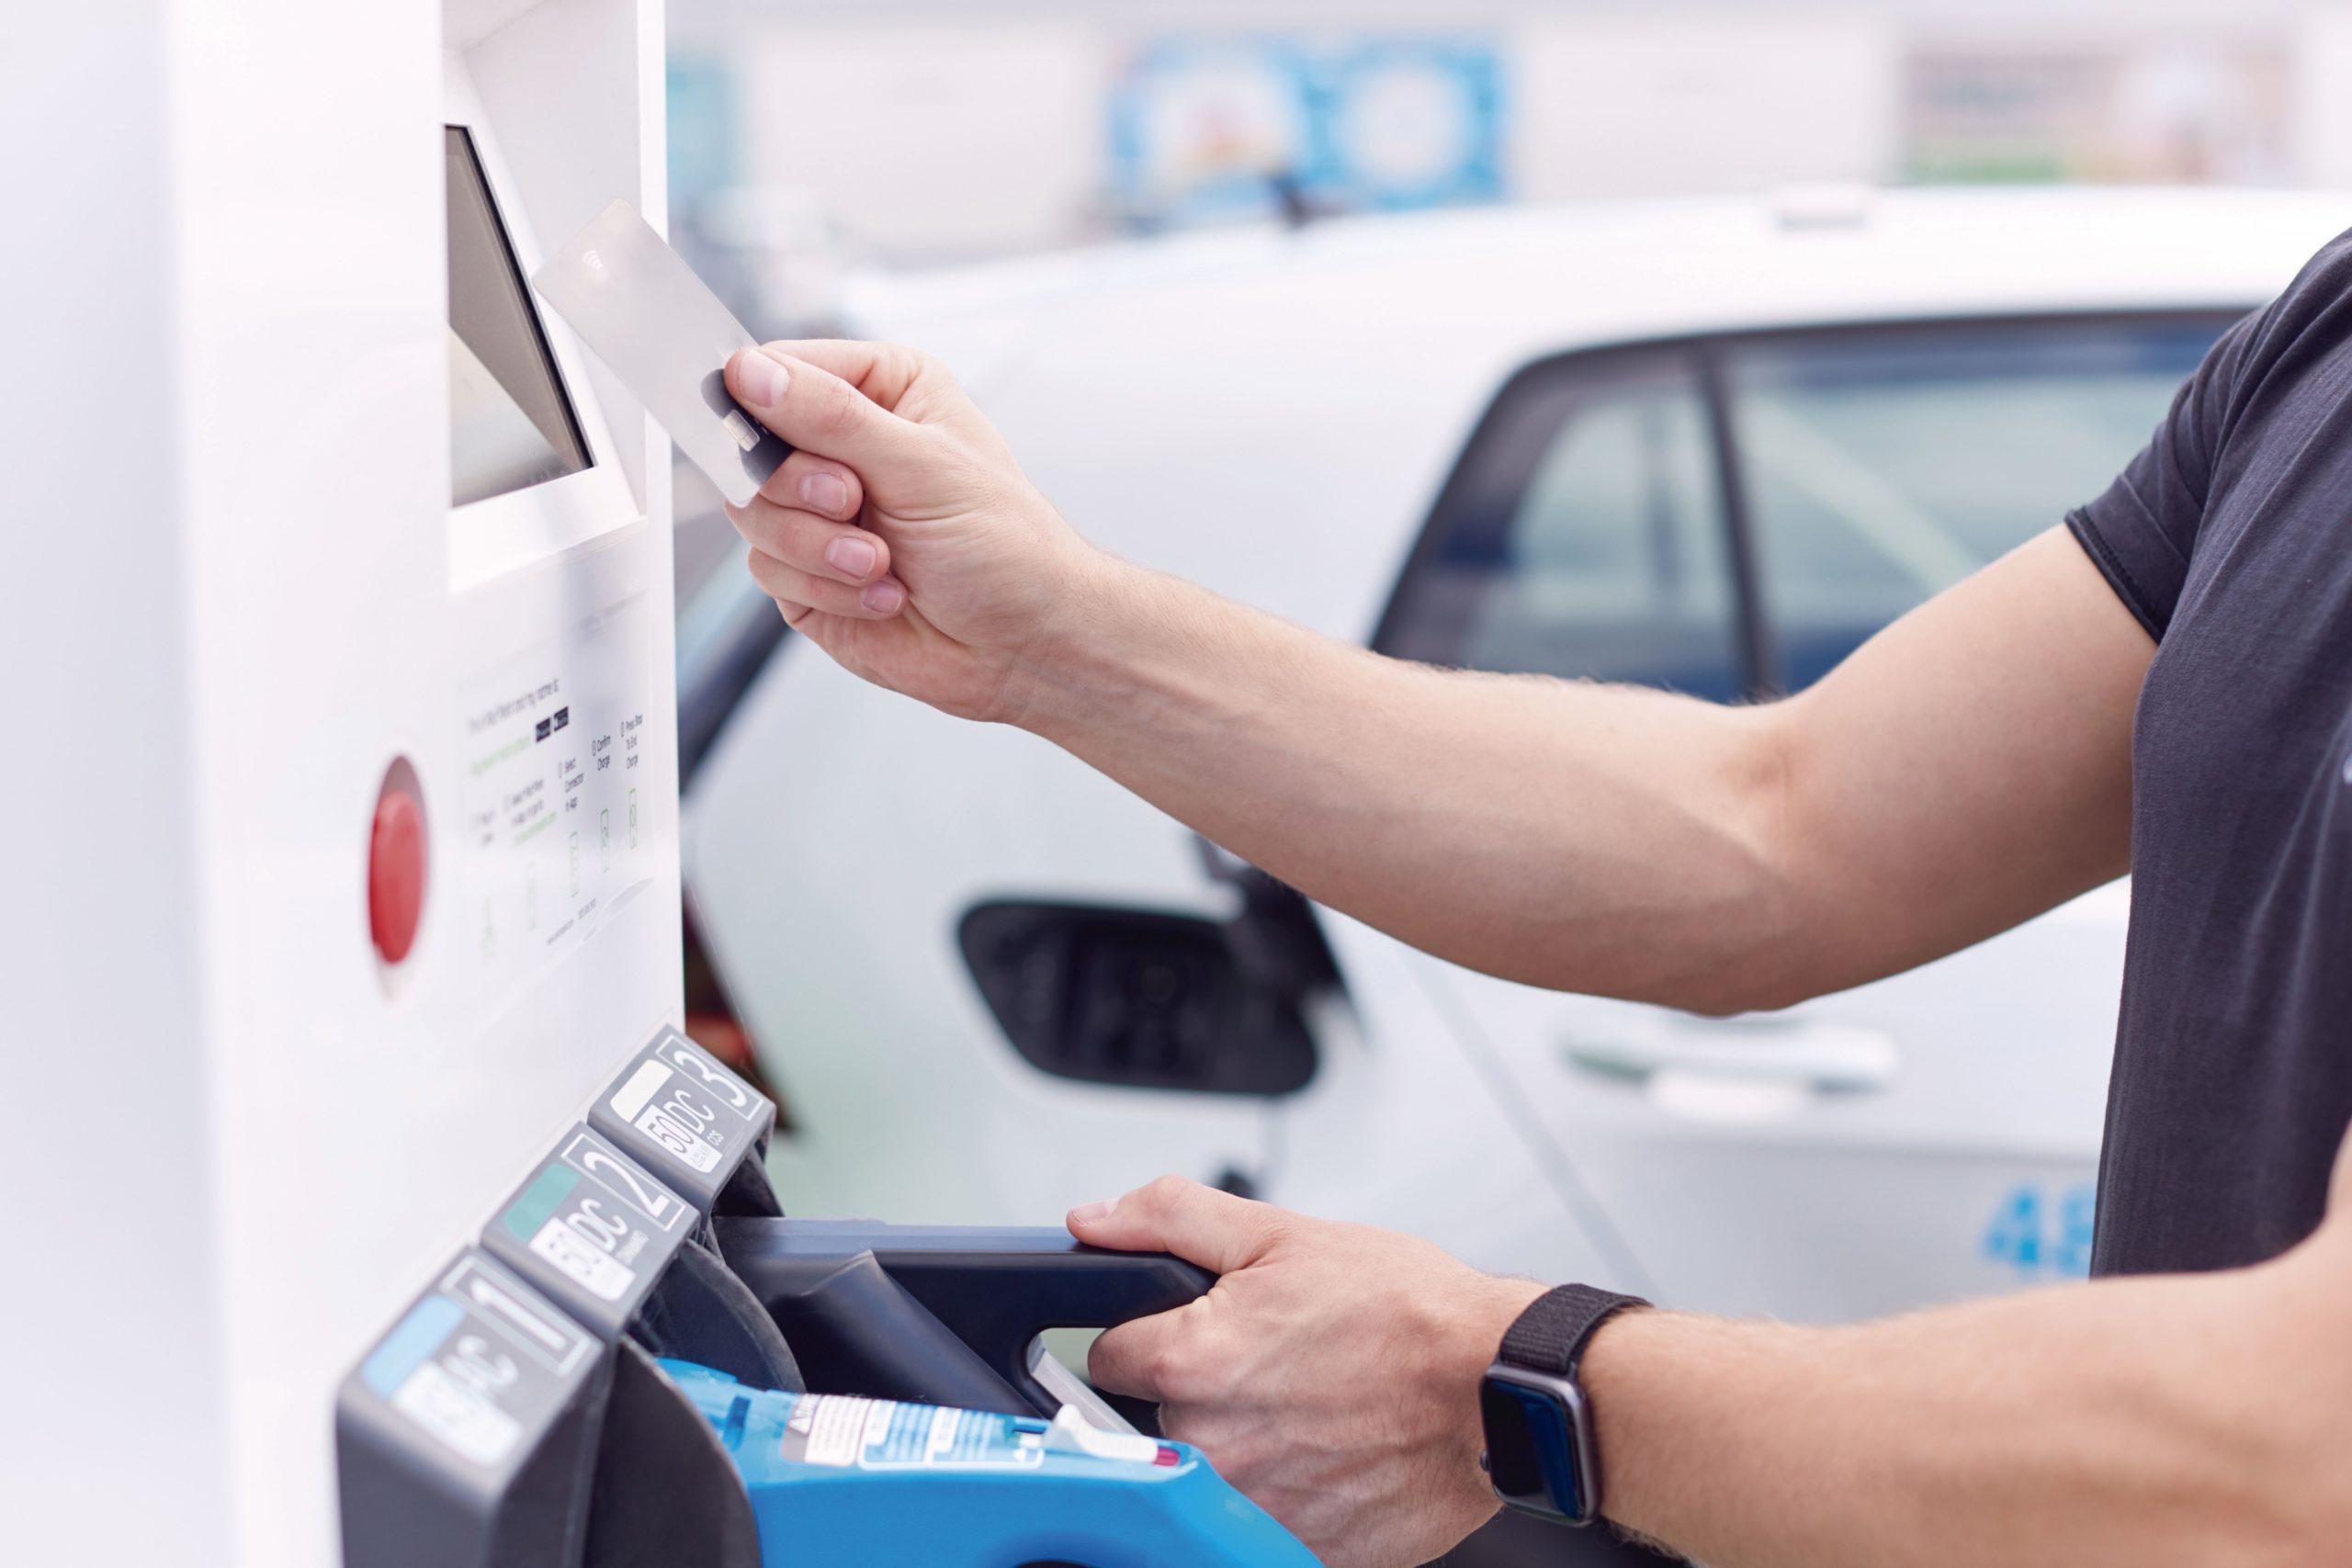 pagar con tarjeta la recarga del VE